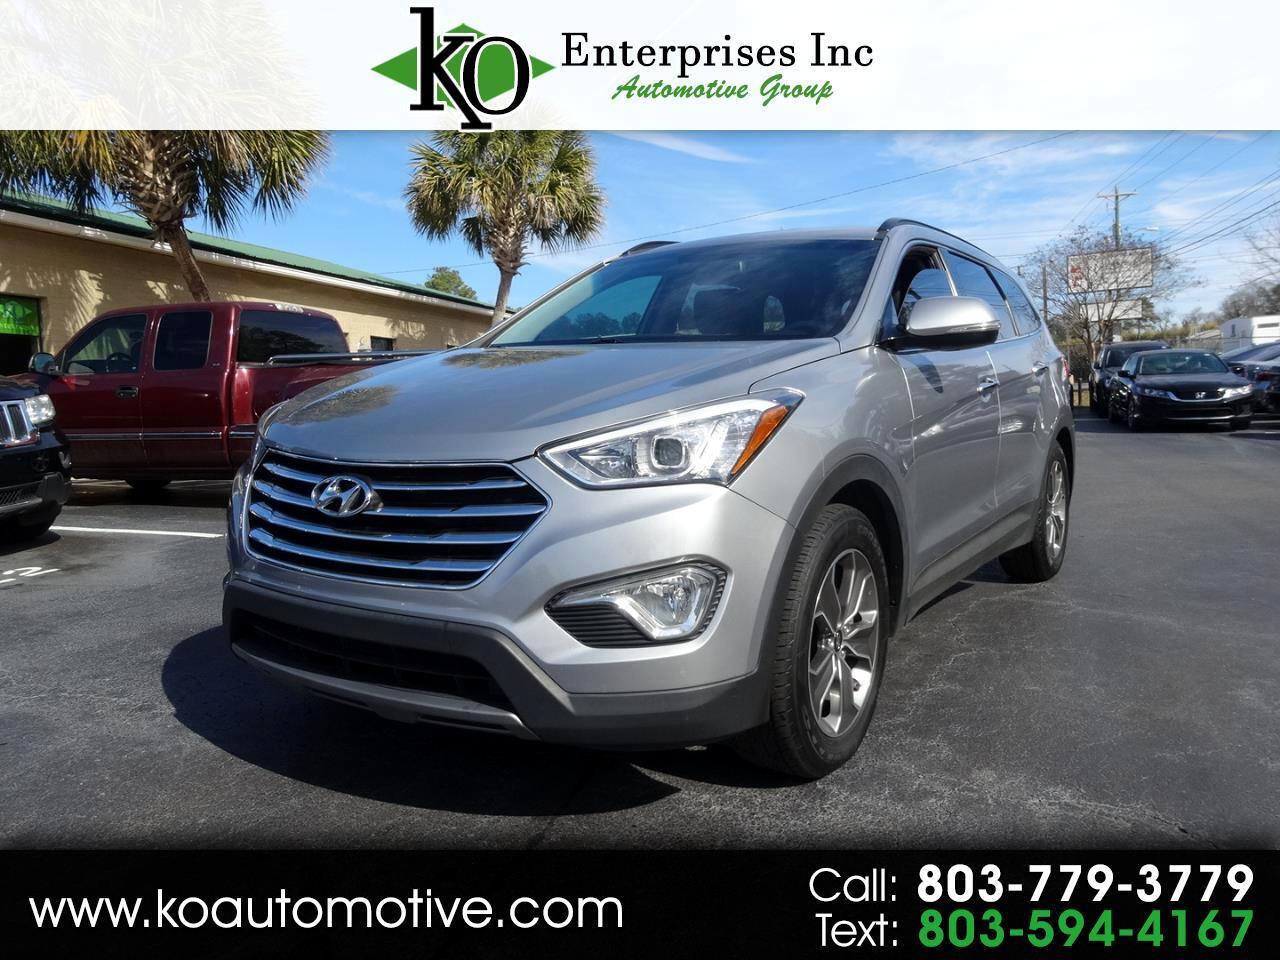 2013 Hyundai Santa Fe FWD 4dr GLS